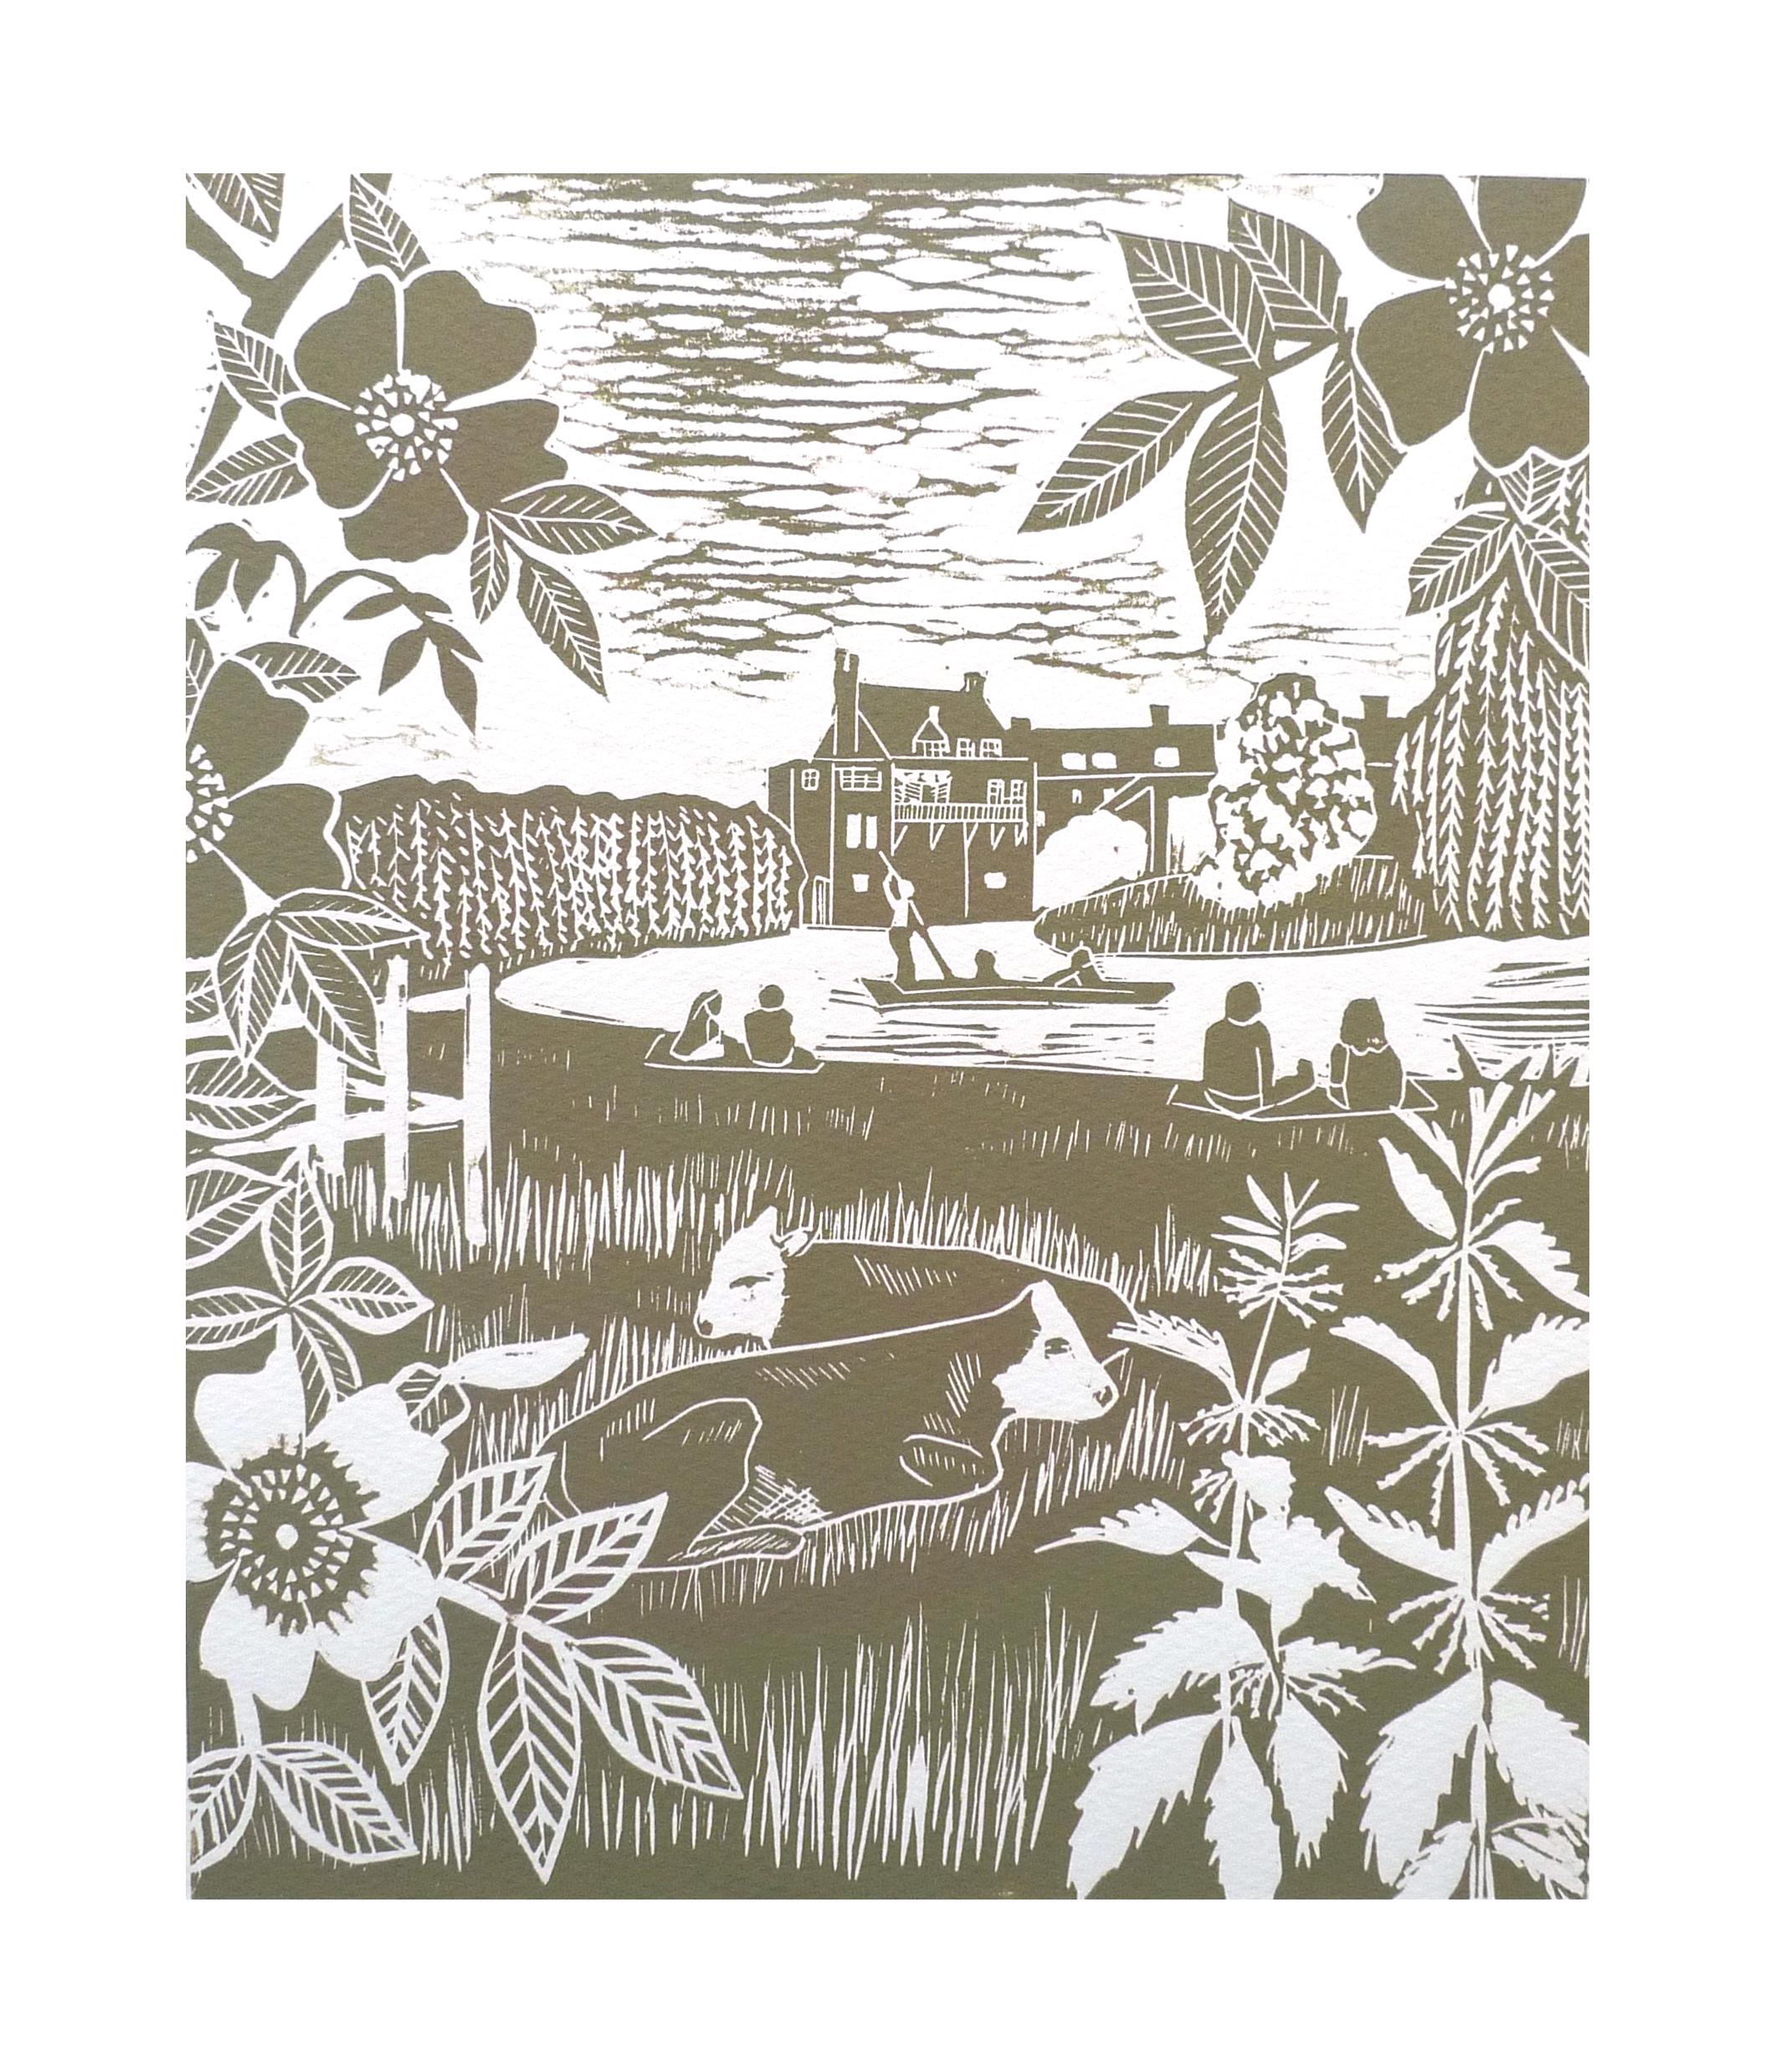 Picnic at the Mill pond  Linocut   21 cm x 25.5 cm   £45